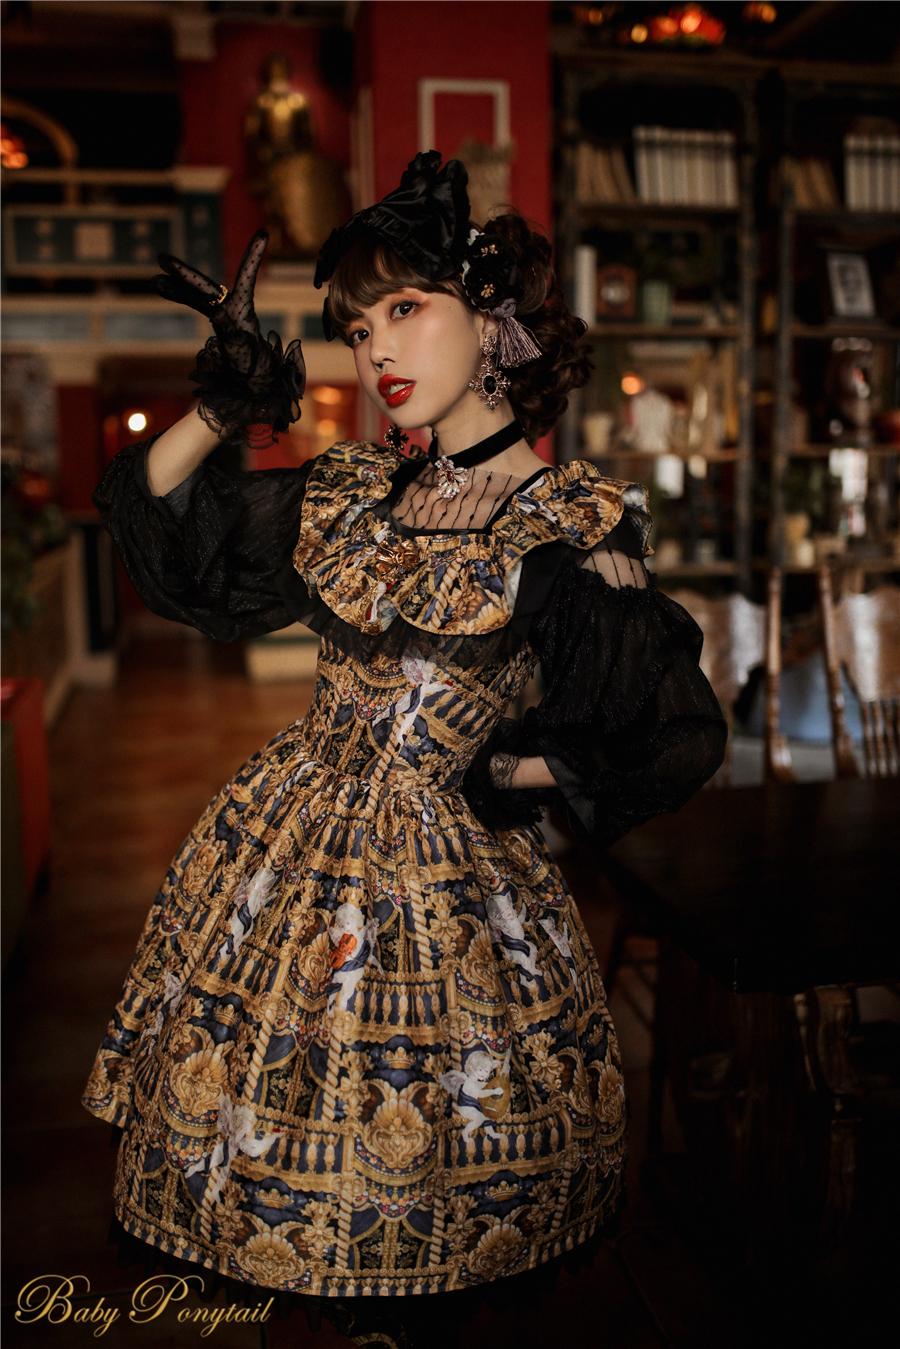 Babyponytail_Model_Ruffle Collar JSK_Black Present Angel_Kaka_0.jpg